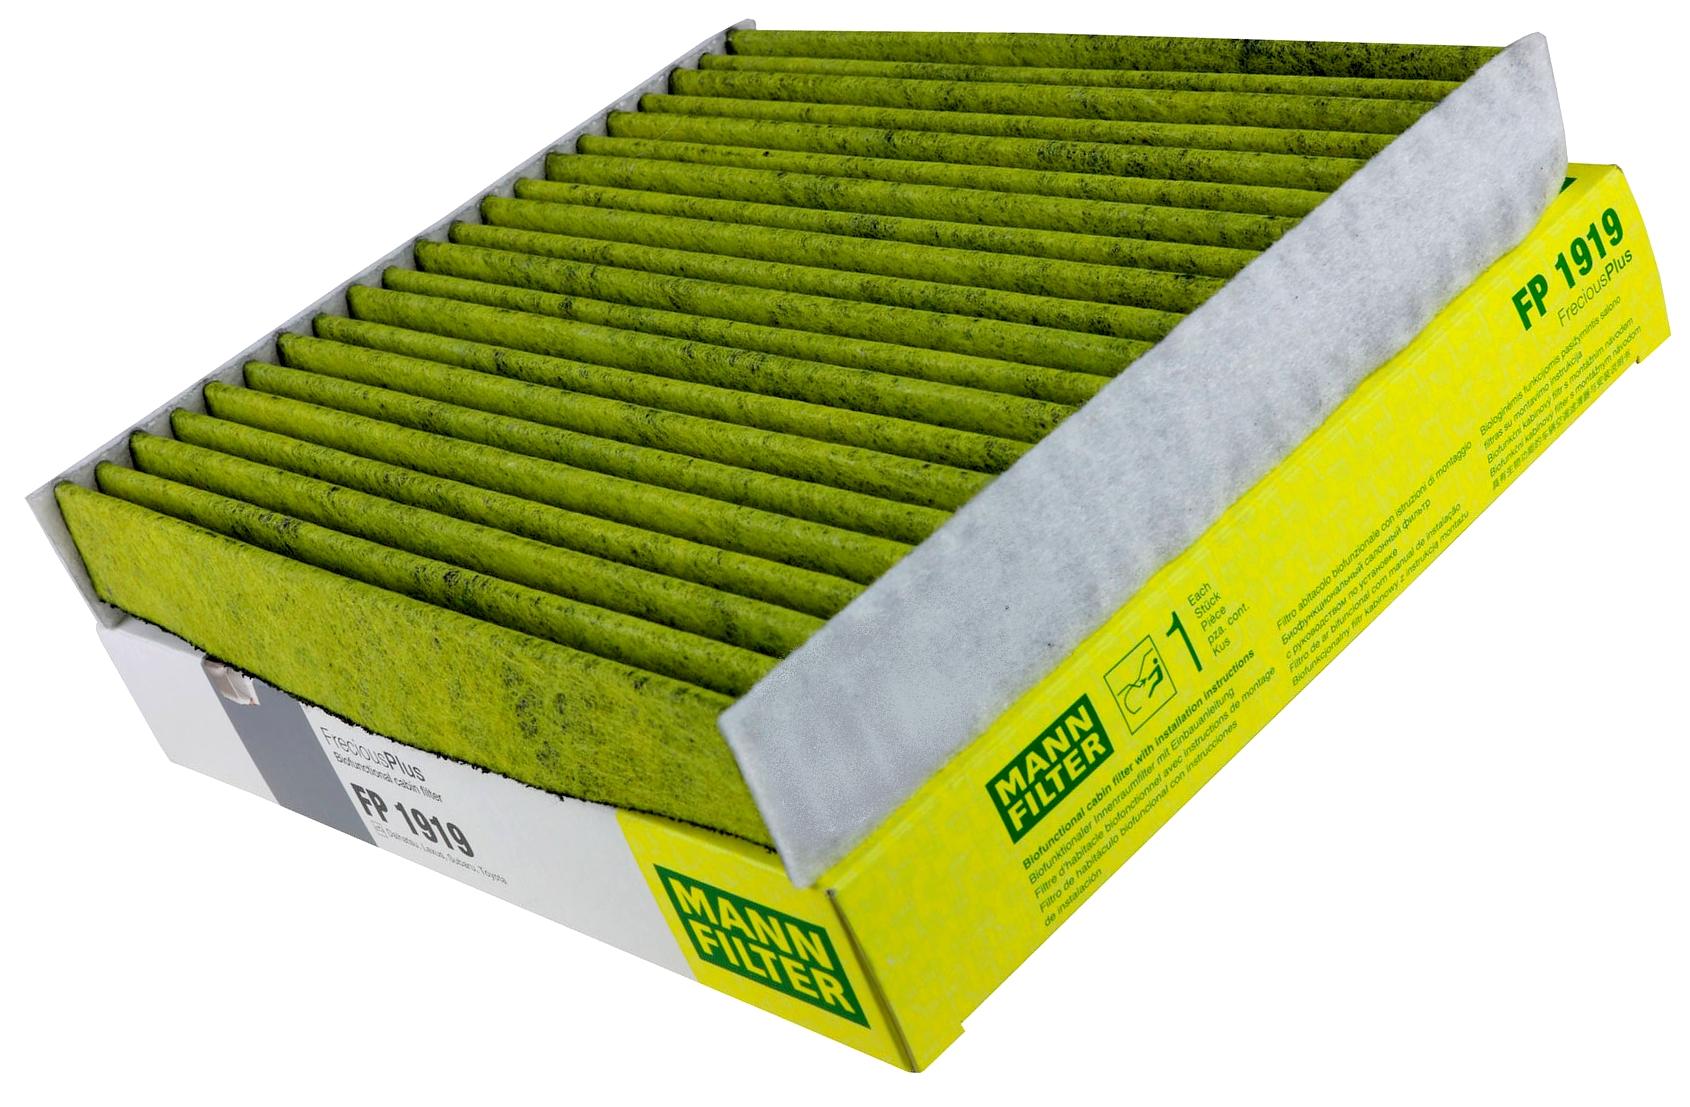 toyota фильтр кабины mann fp1919 biofunkcjonalny